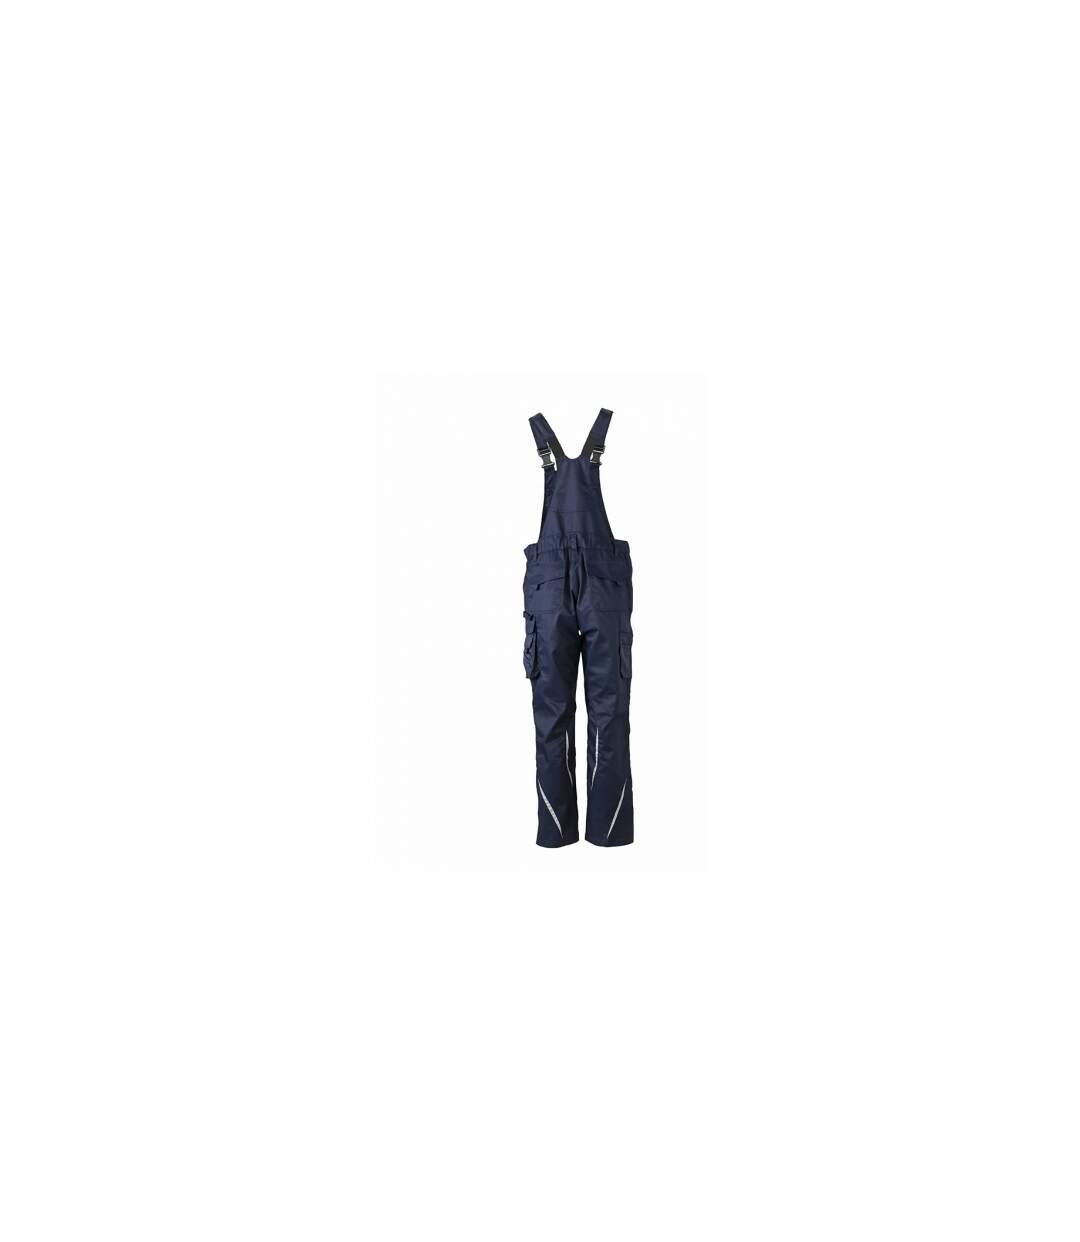 Pantalon de travail homme à bretelles - JN833 - bleu marine - salopette artisan